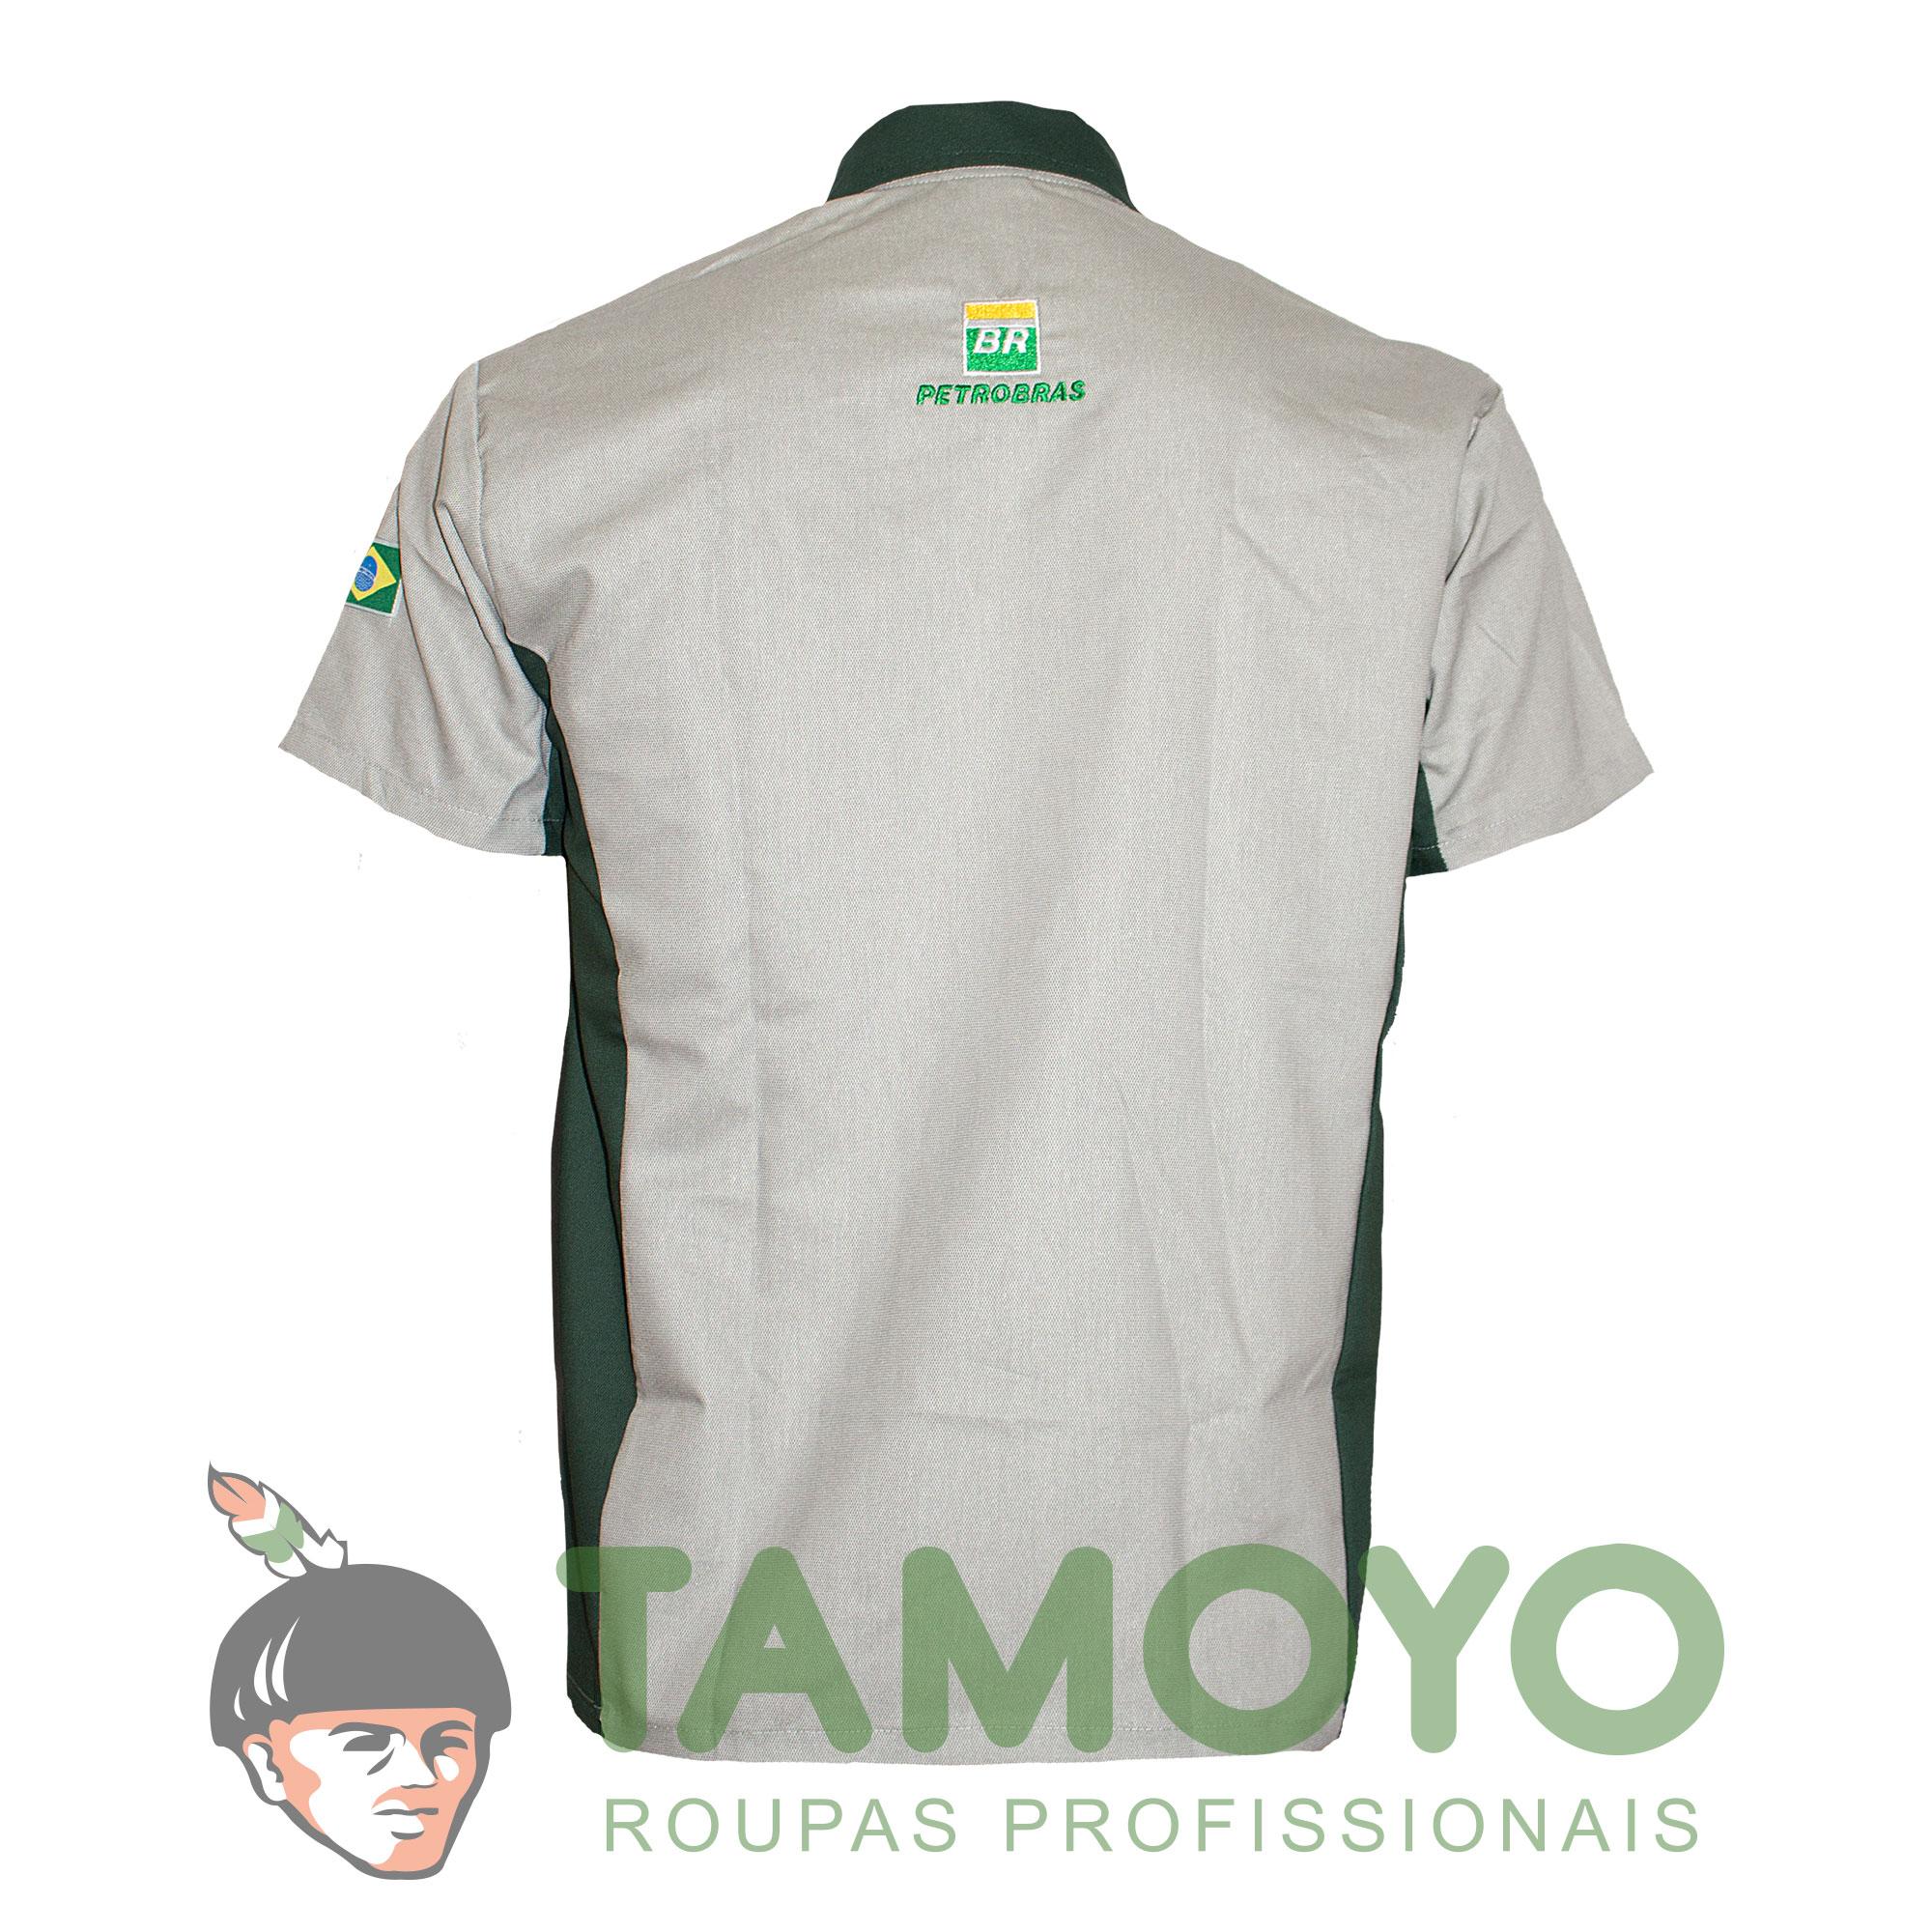 camisa-pista-masculino-br-roupas-tamoyo-uniformes-profissionais-c